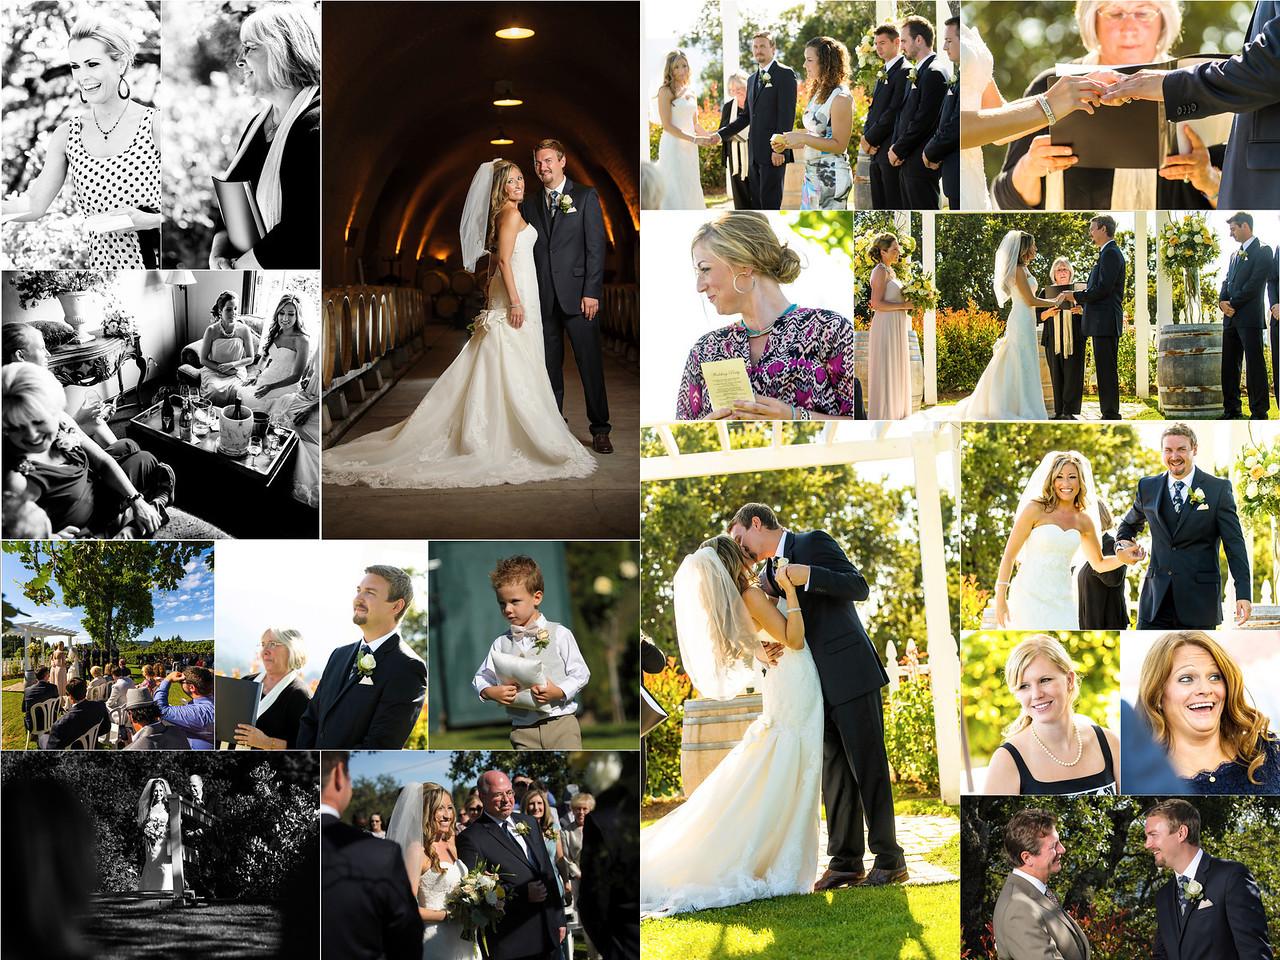 Erica_and_Justin_Byington_Winery_Los_Gatos_Wedding_Photography_4x6_Photo_Board_05